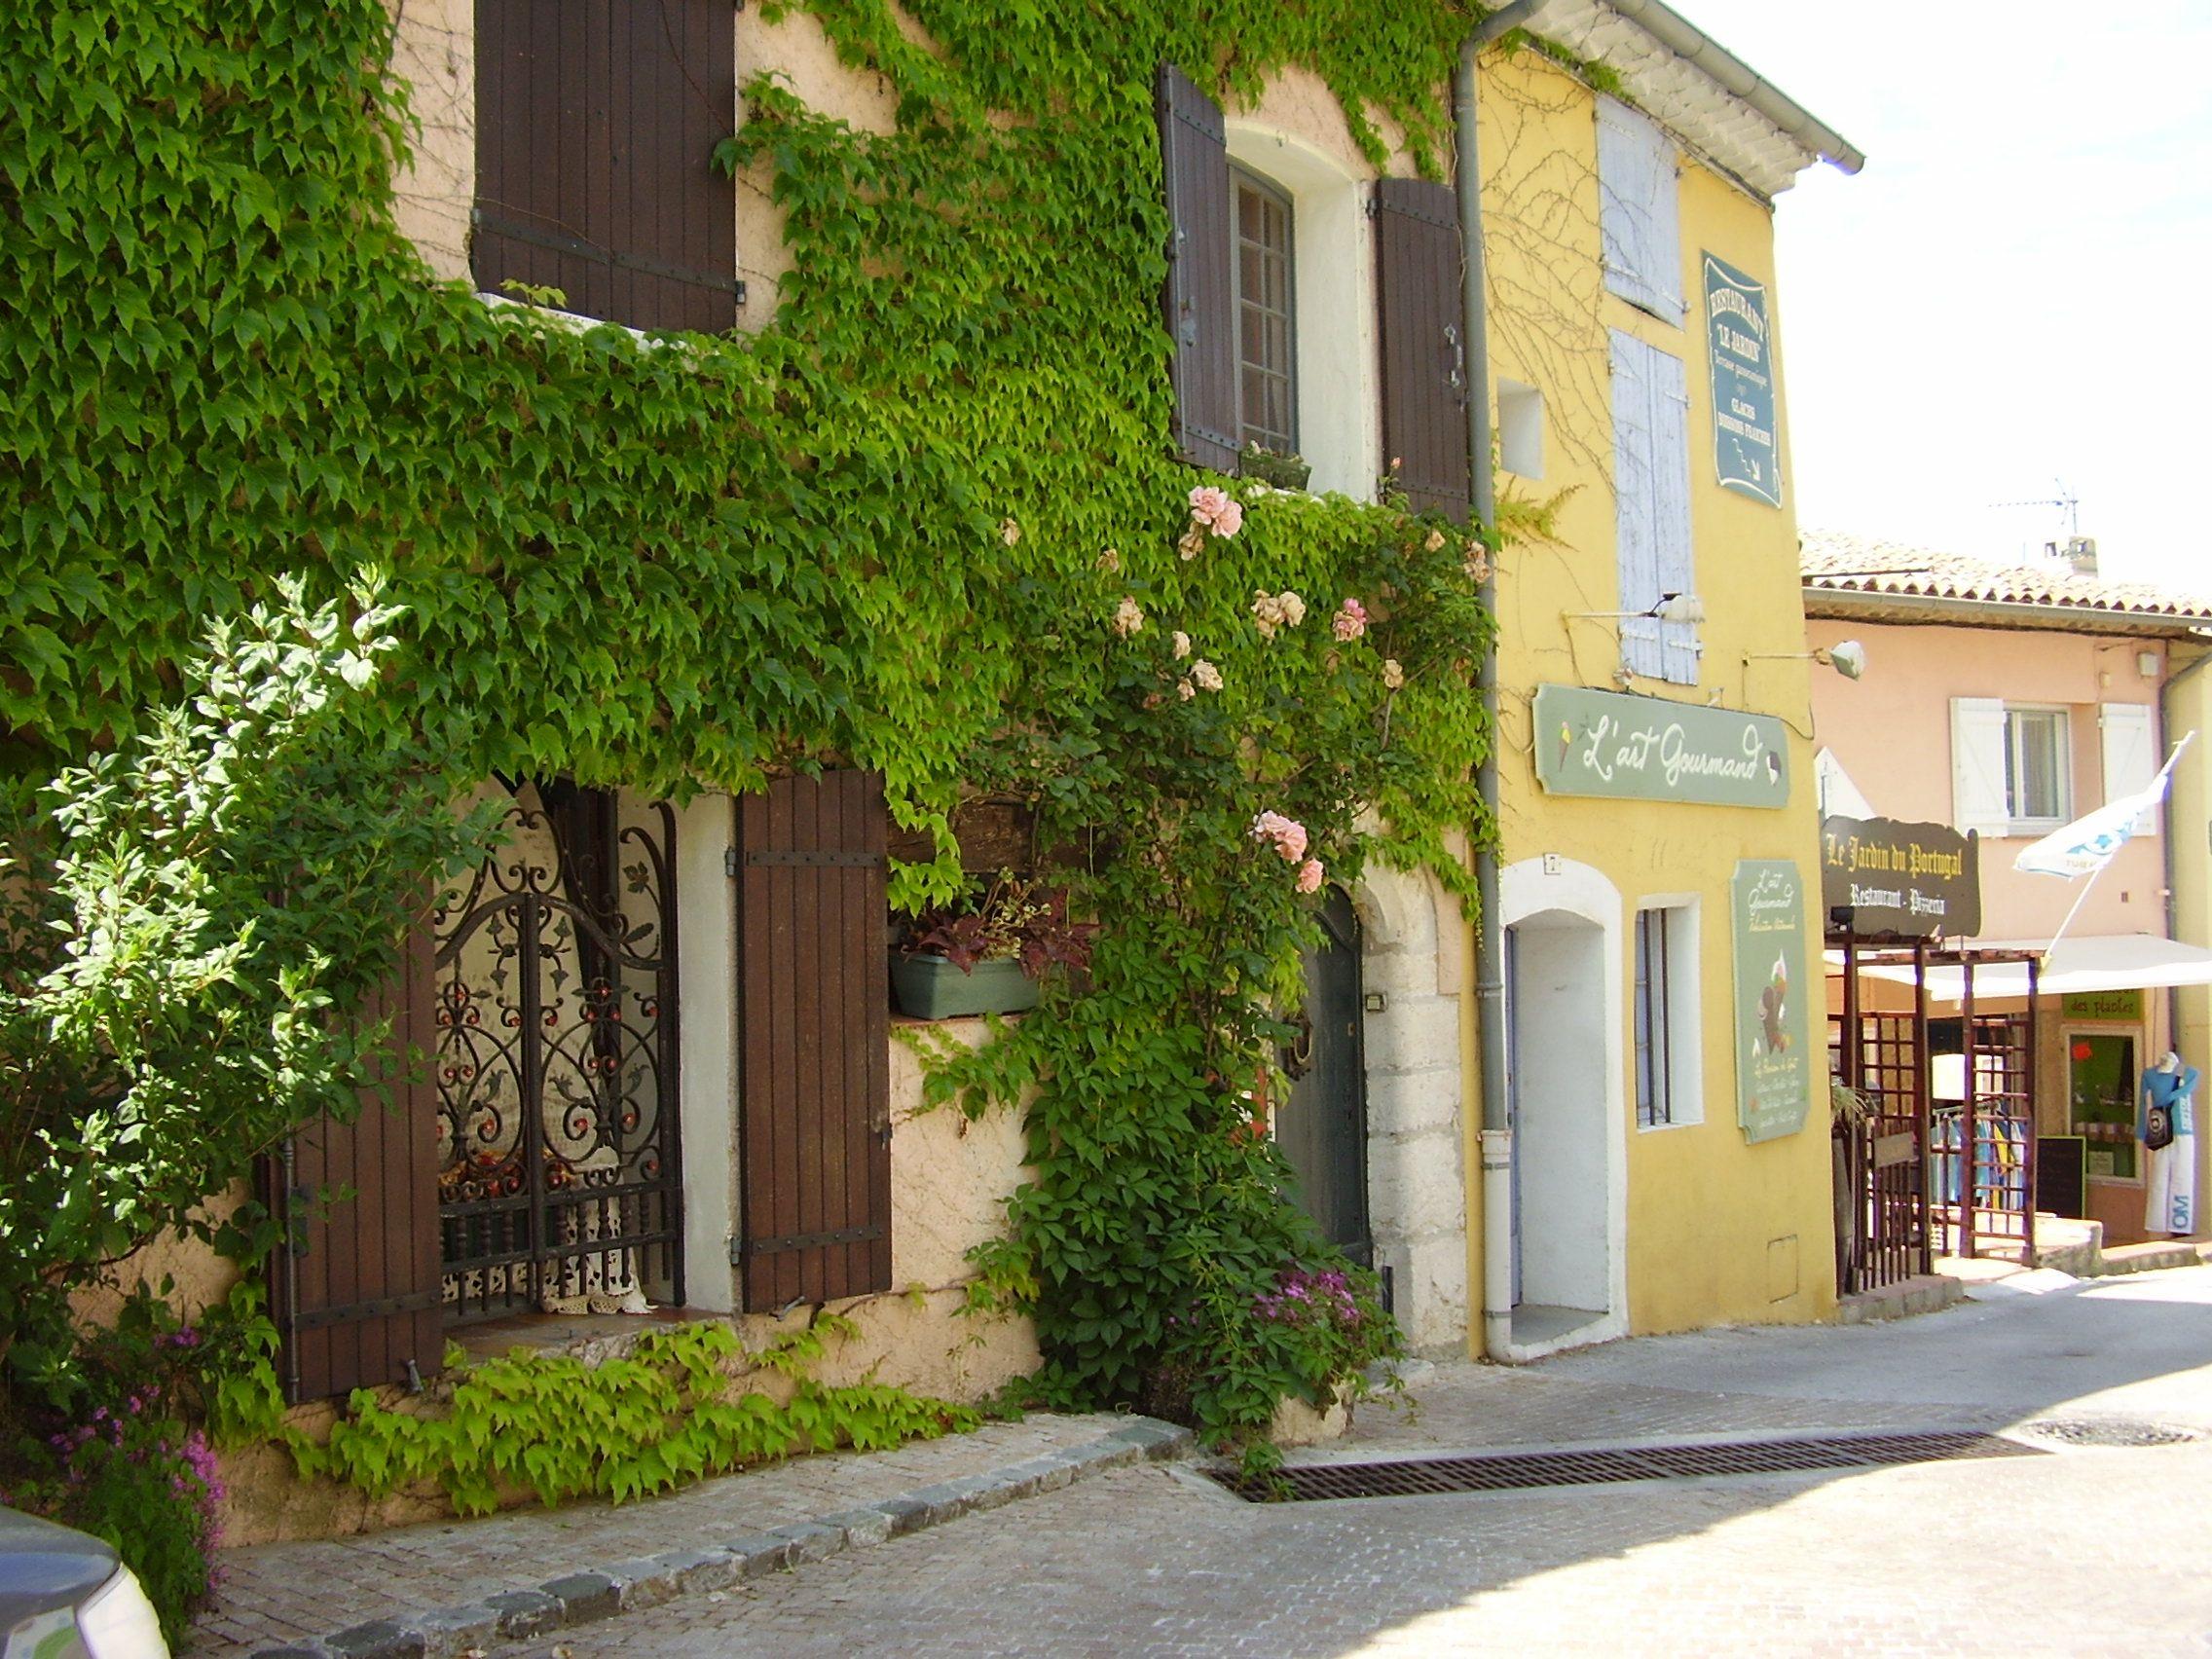 Le Castellet France A Medieval Village Built On A Steep Hill Side